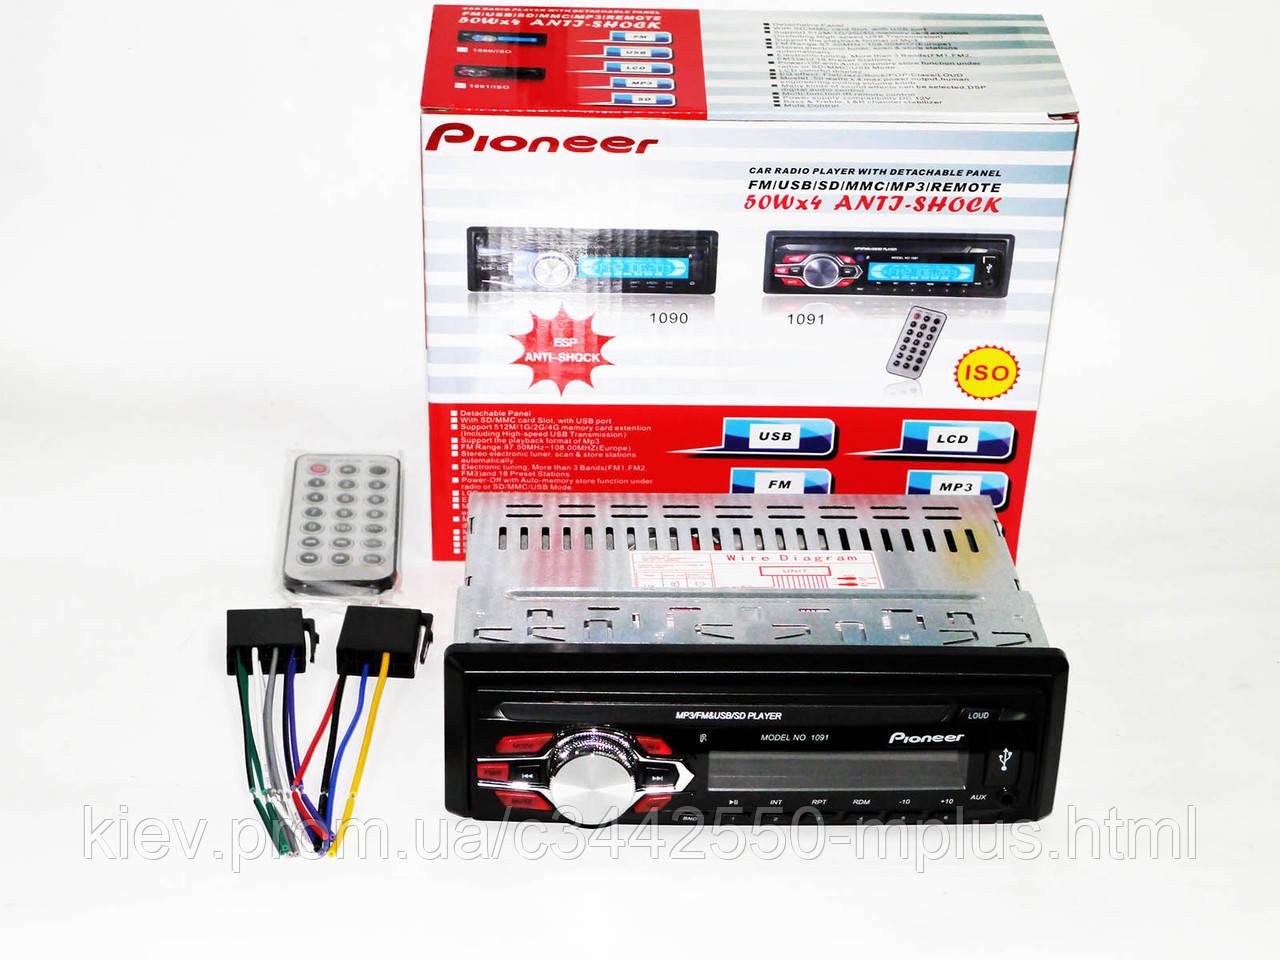 Автомагнитола Pioneer 1091 Съемная панель Usb+Sd+Fm+Aux+ пульт